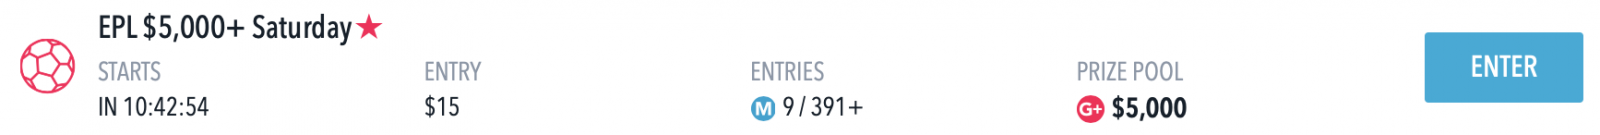 Draftstars contest